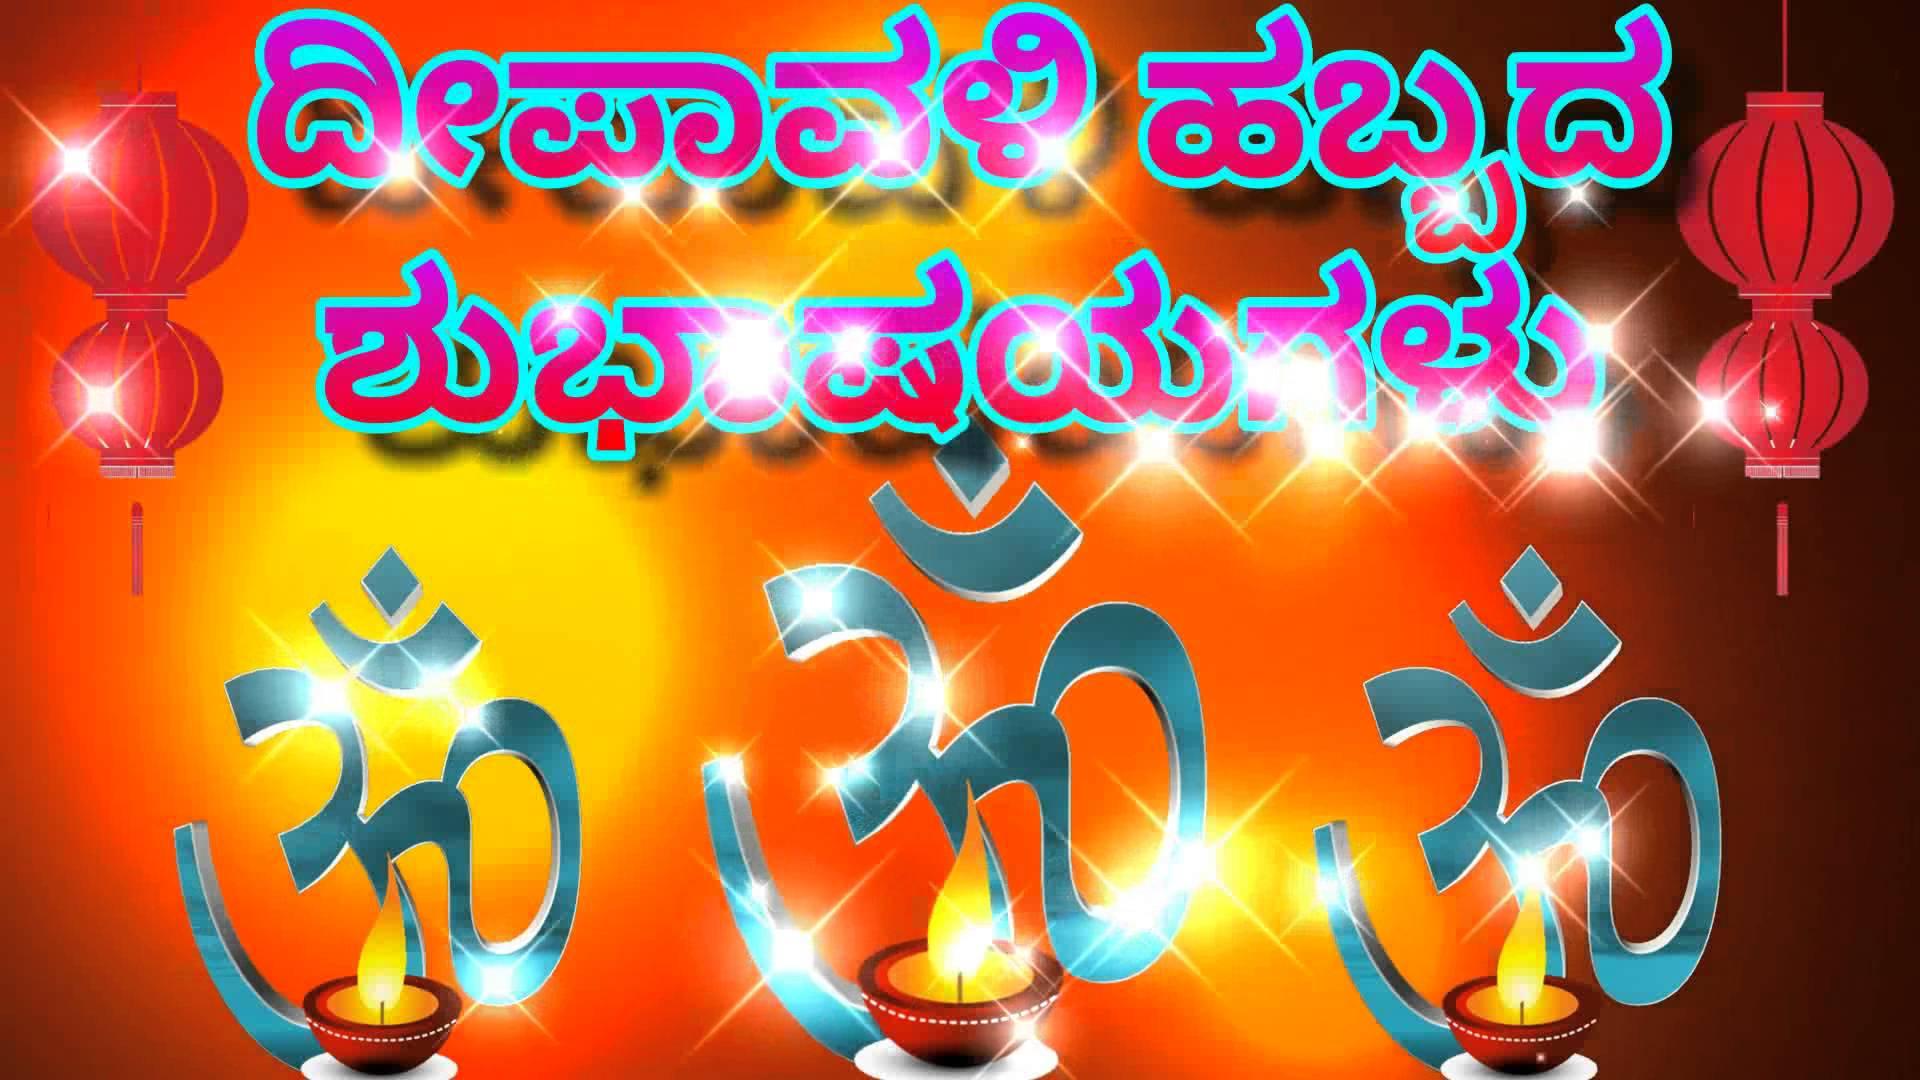 Deepavali Wishes Images in Kannada